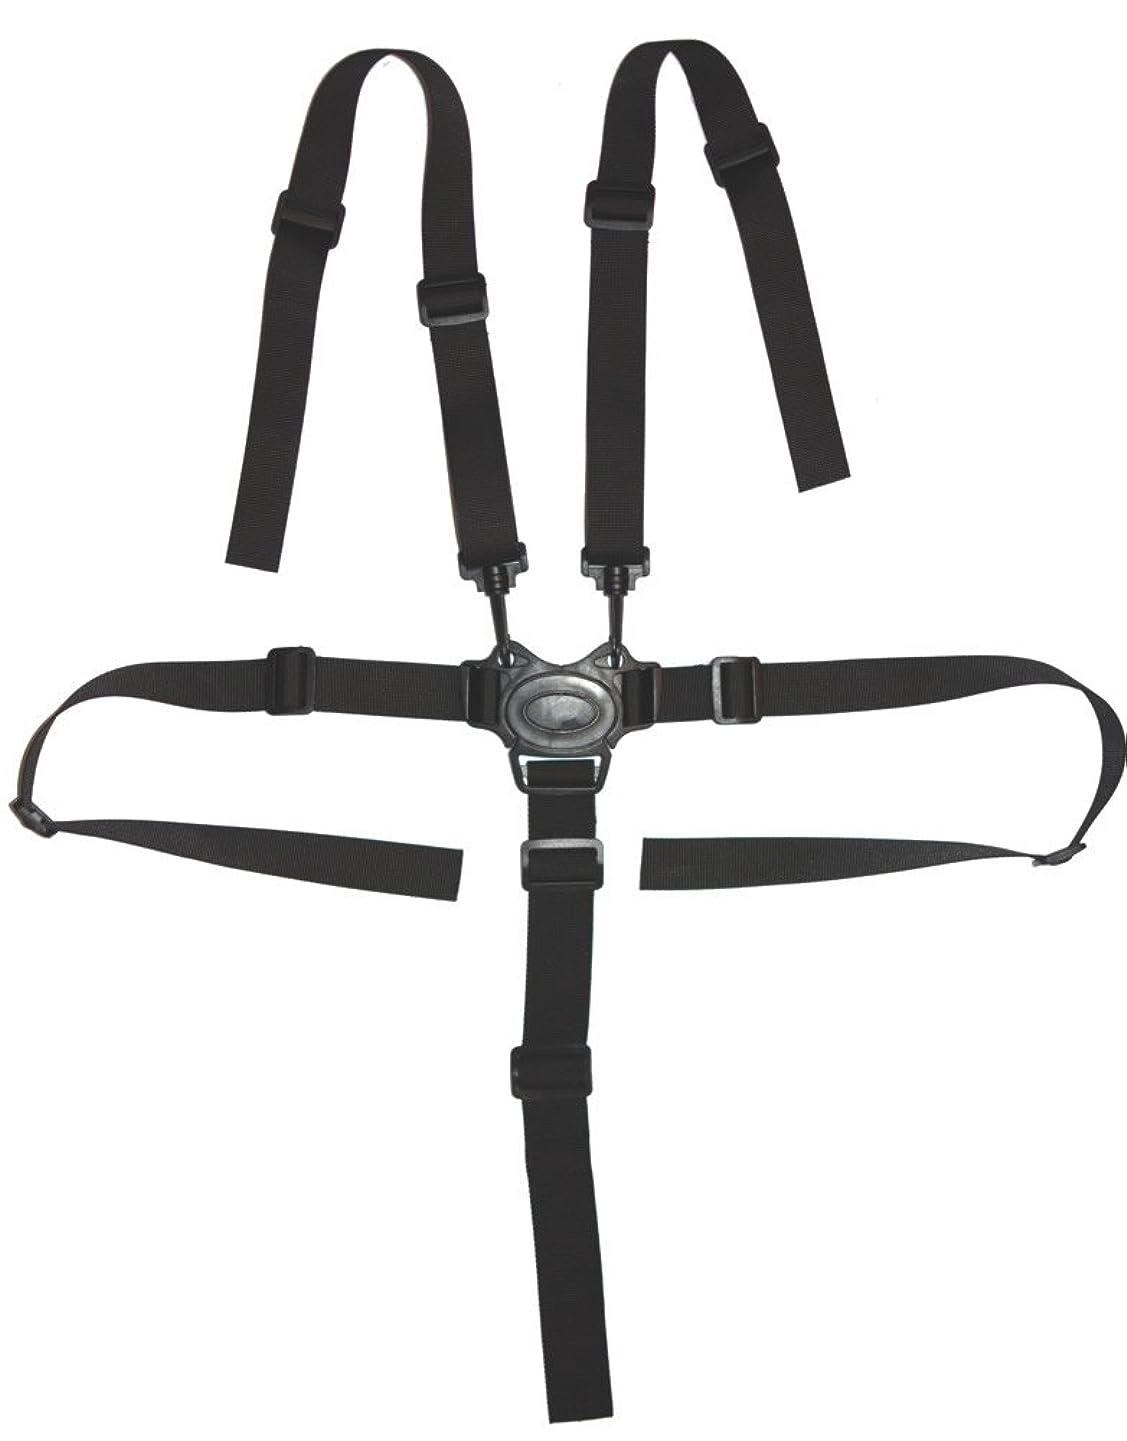 Universal Baby 5 Point Harness Belt for Stroller High Chair Pram Buggy Children Kid Pushchair